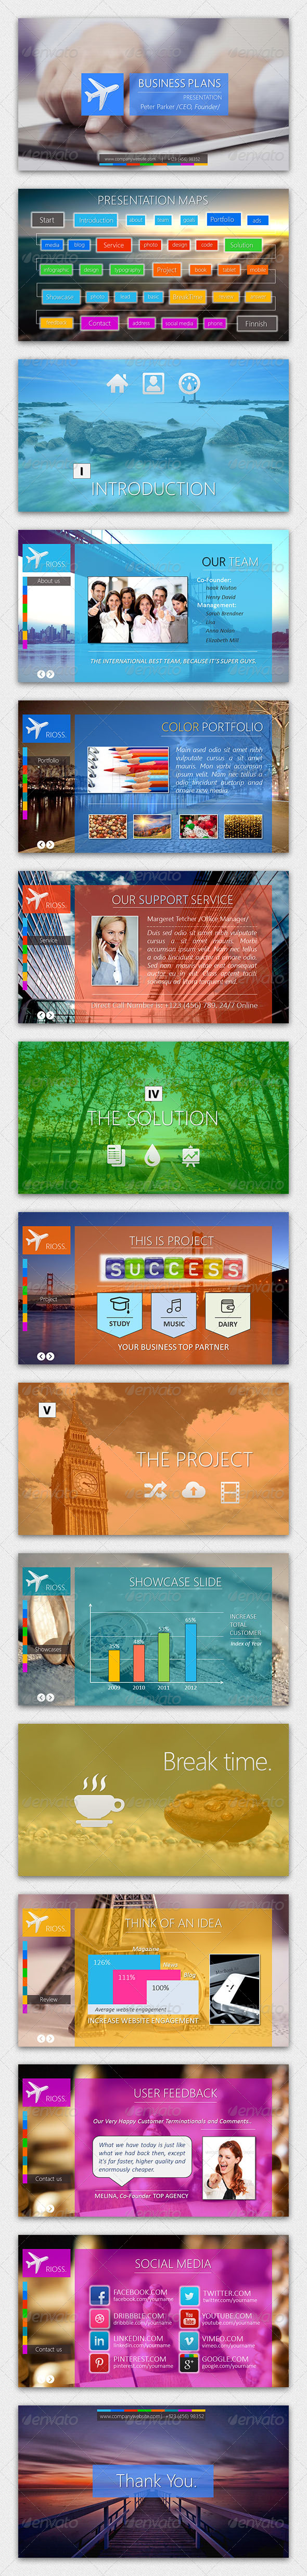 GraphicRiver Rioss Powerpoint Presentation Template 4276814